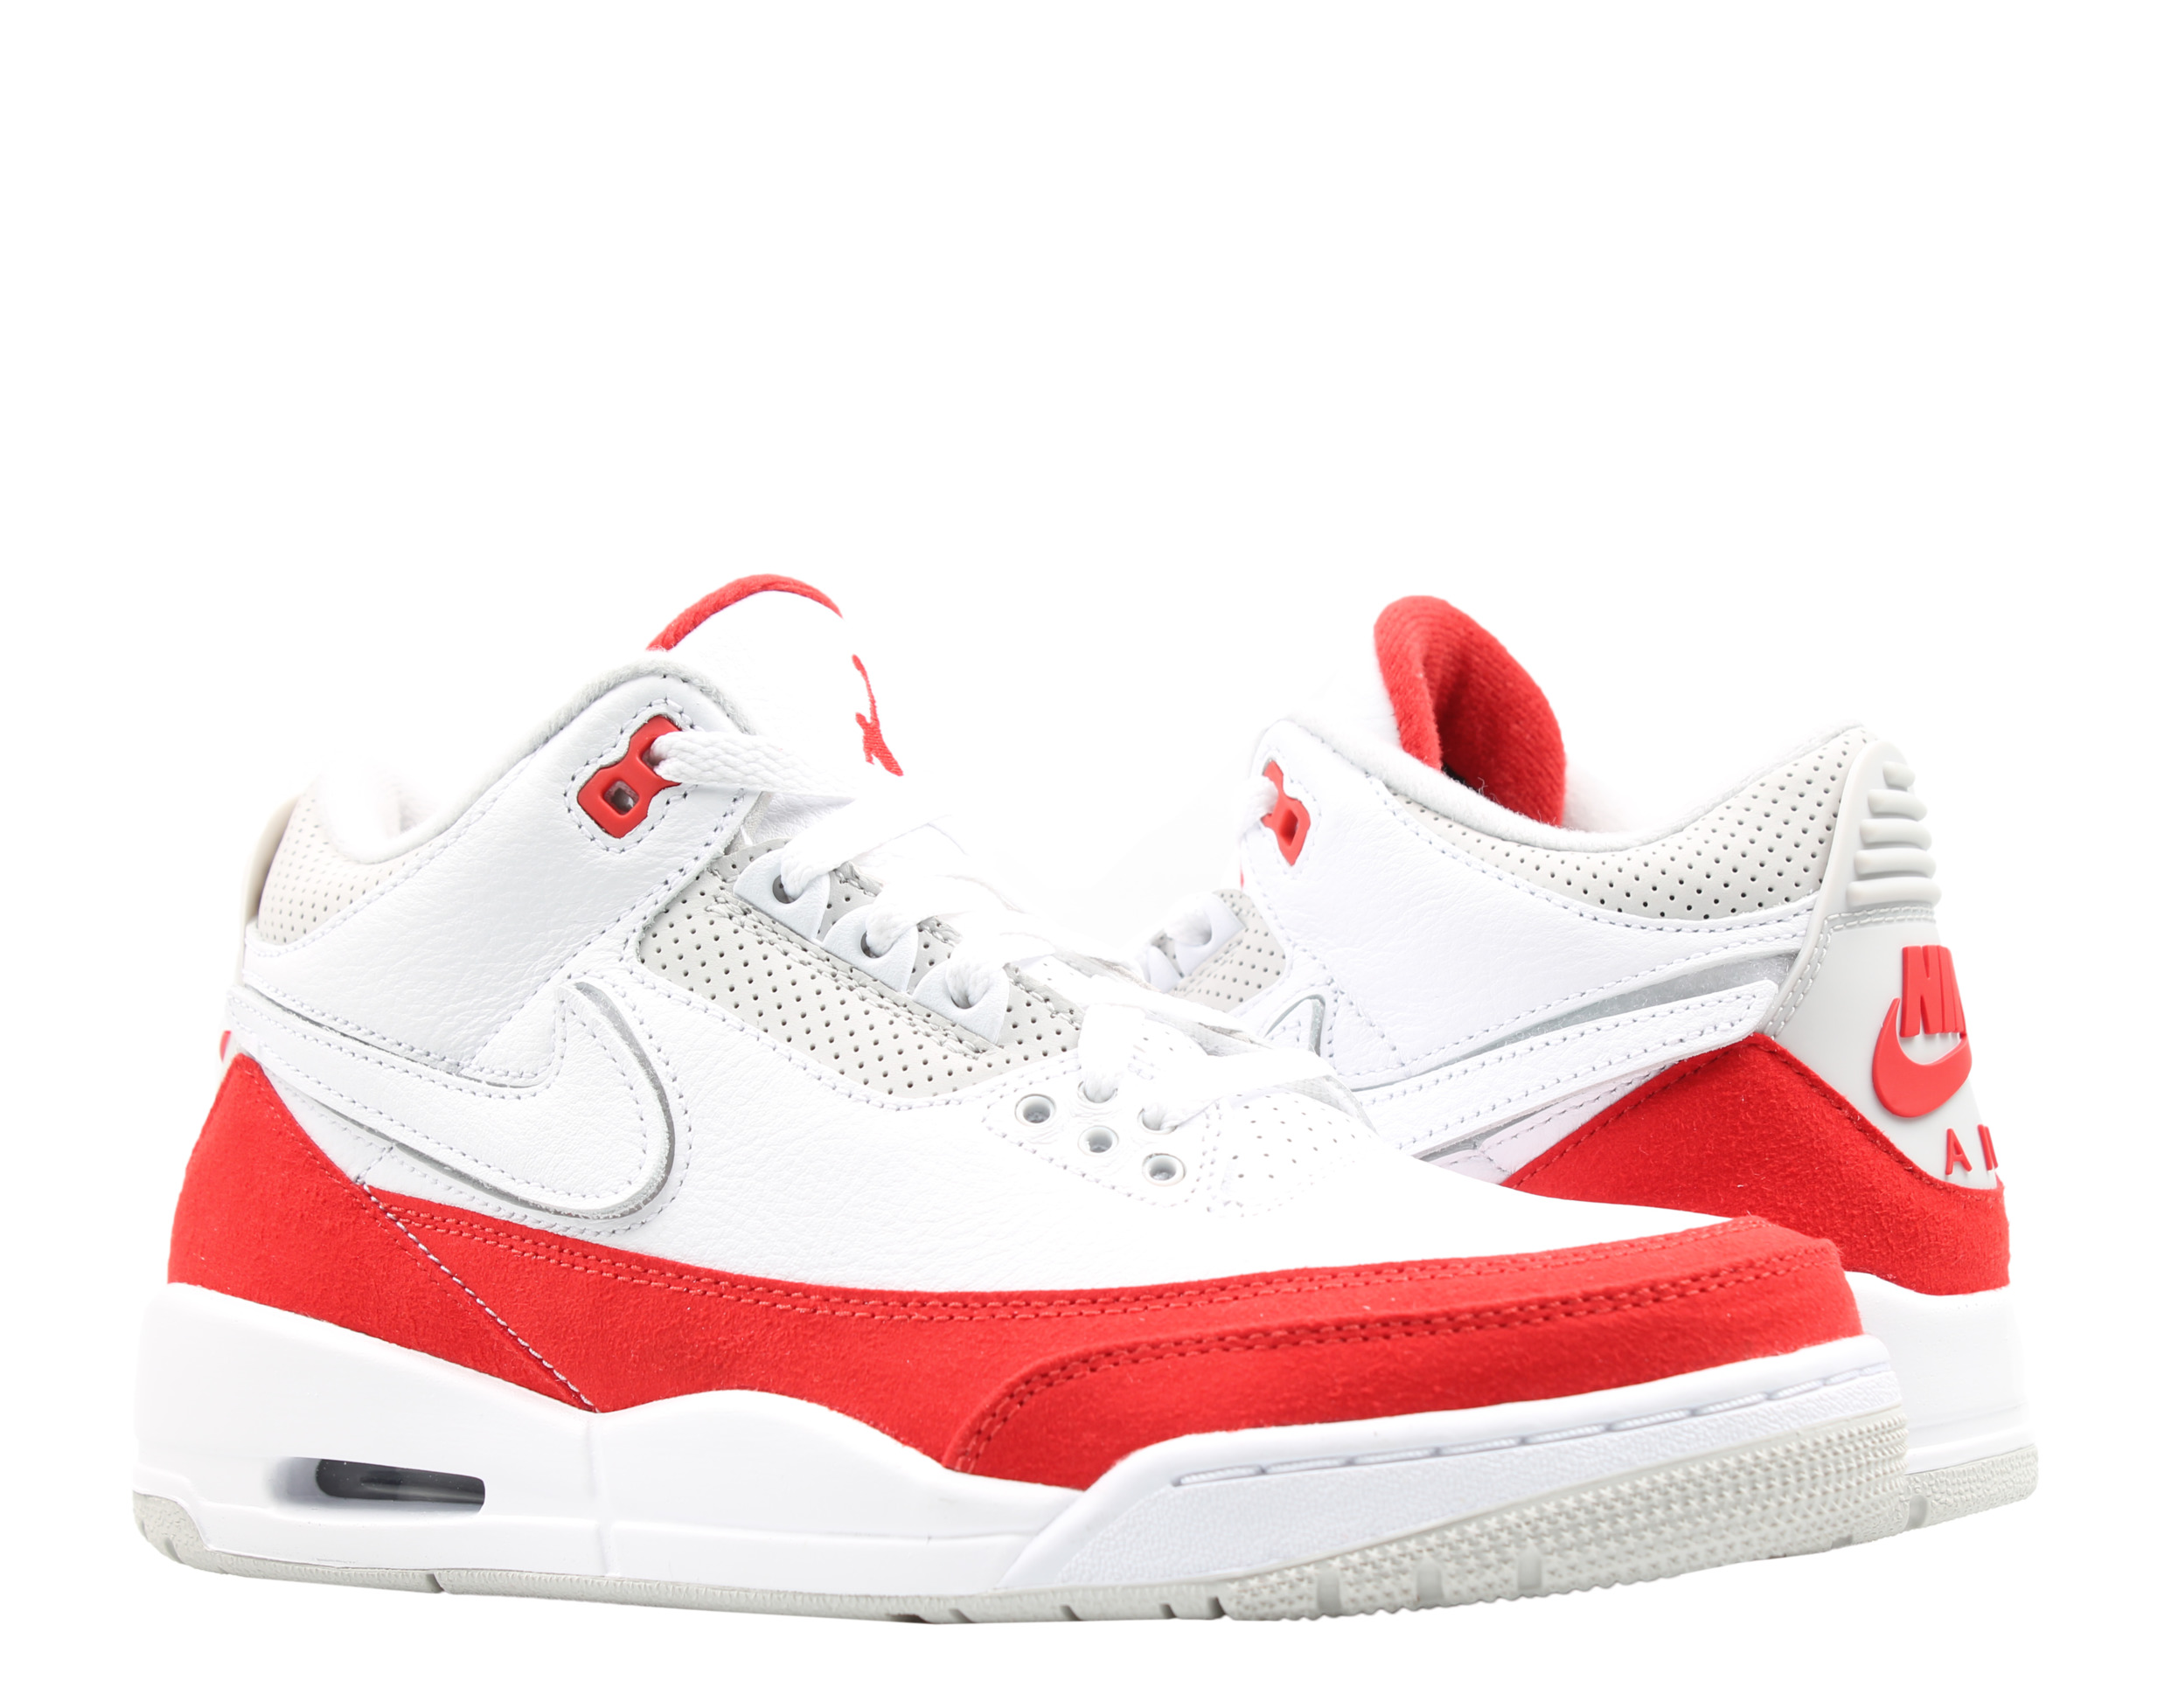 Jordan - Nike Air Jordan 3 Retro Tinker